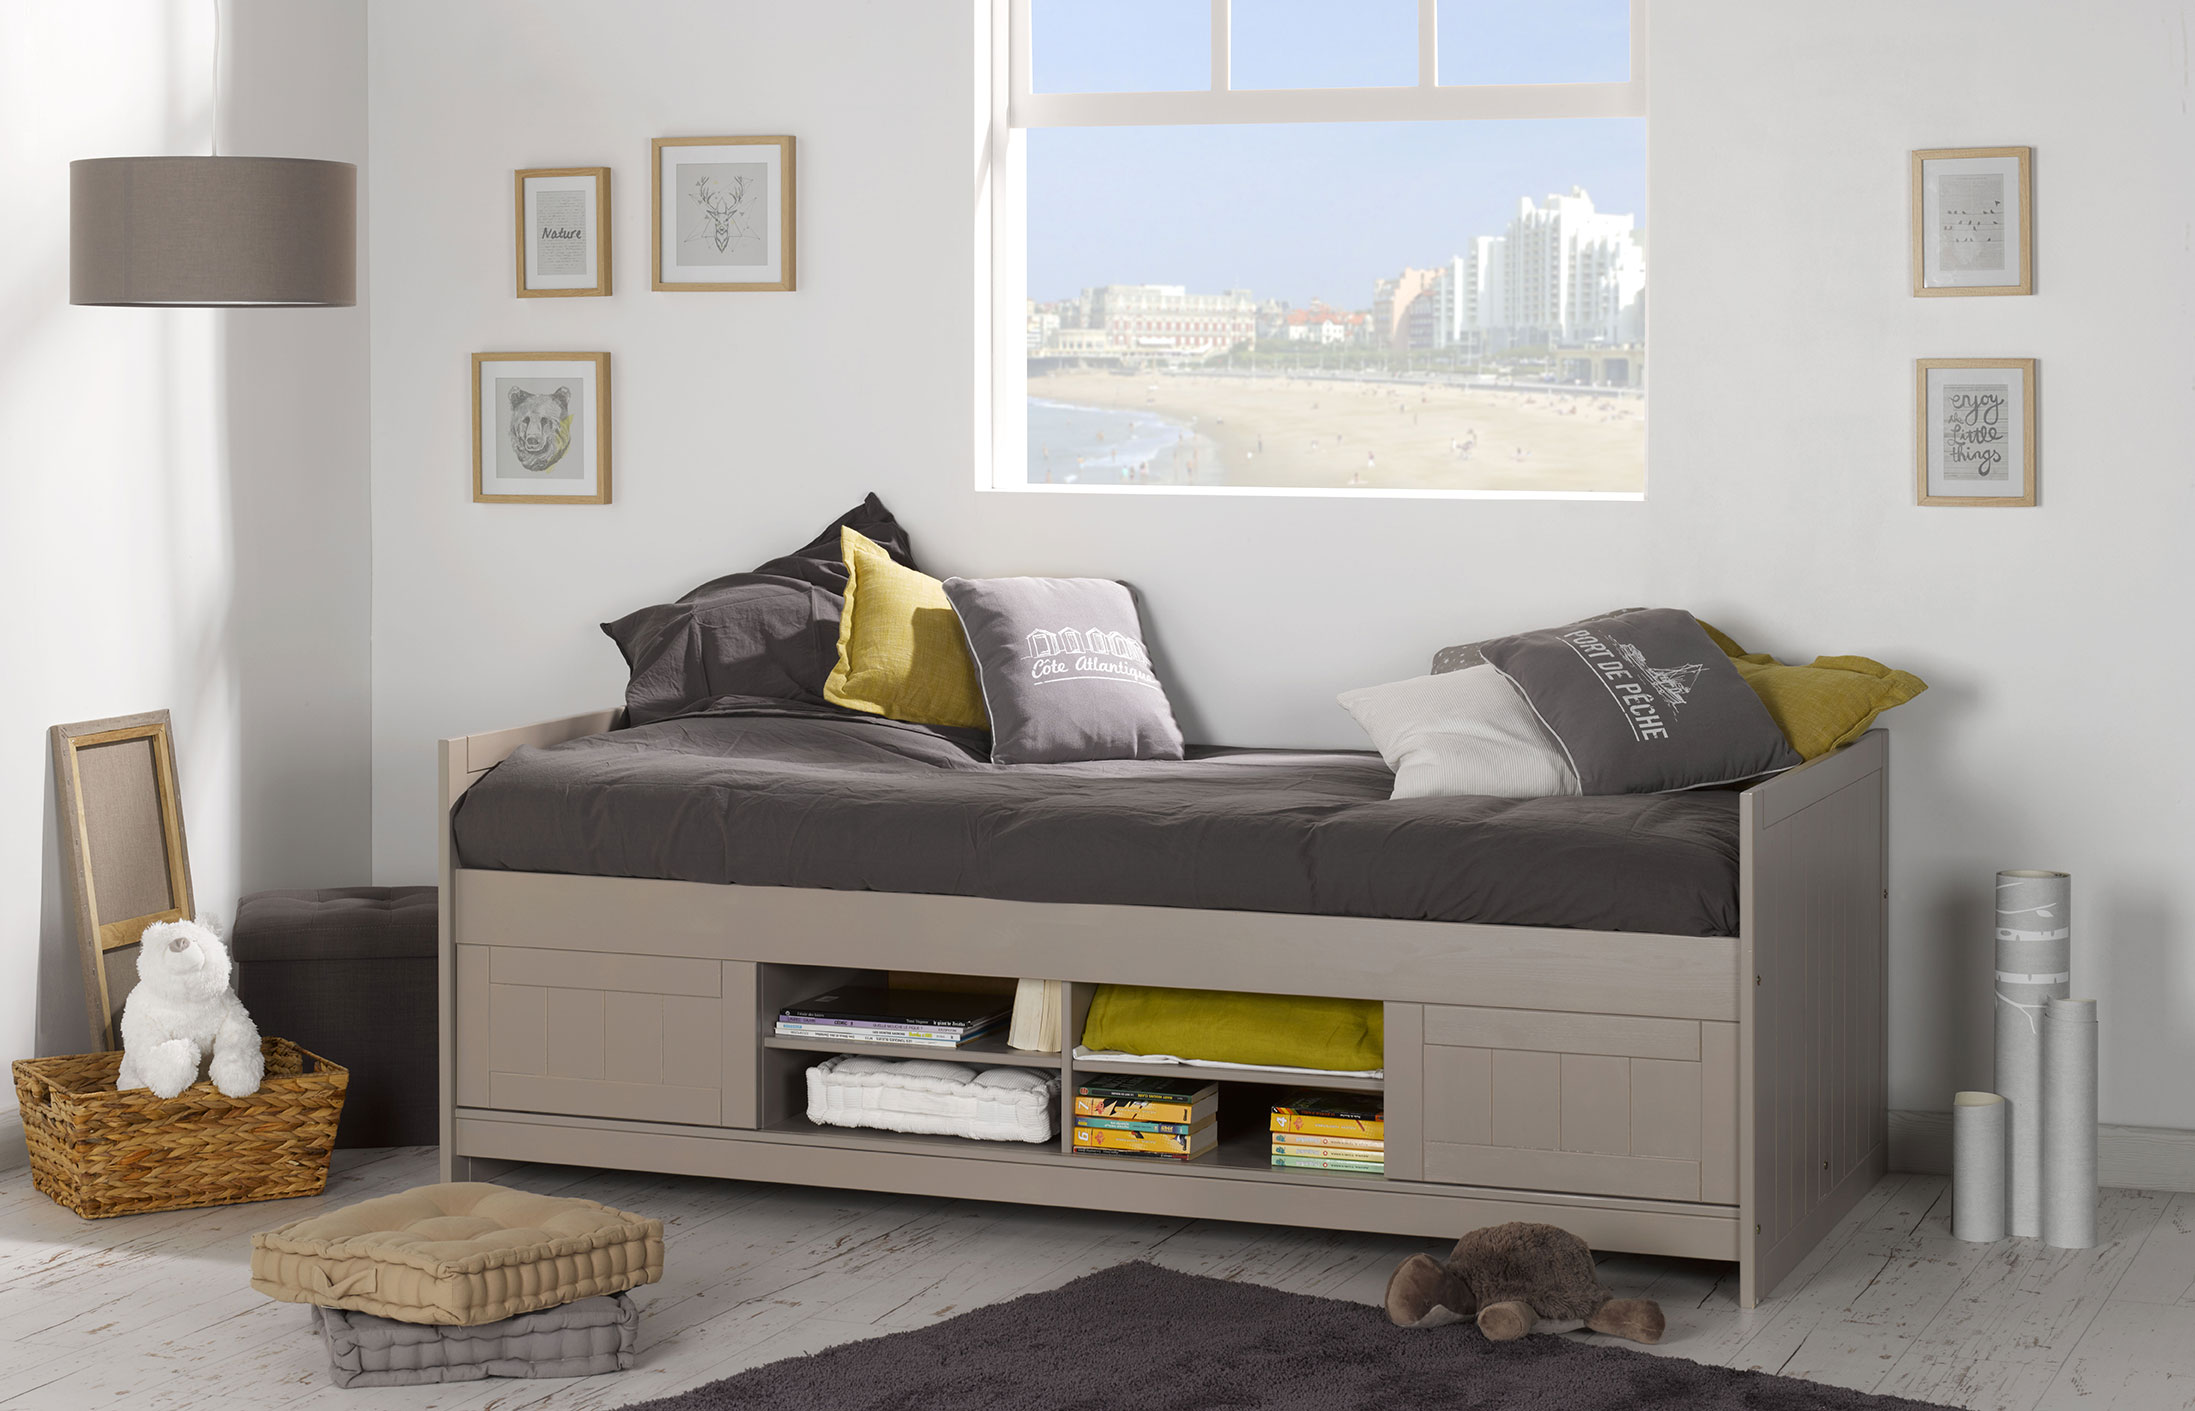 lit junior avec rangements teddy lin idkid 39 s. Black Bedroom Furniture Sets. Home Design Ideas